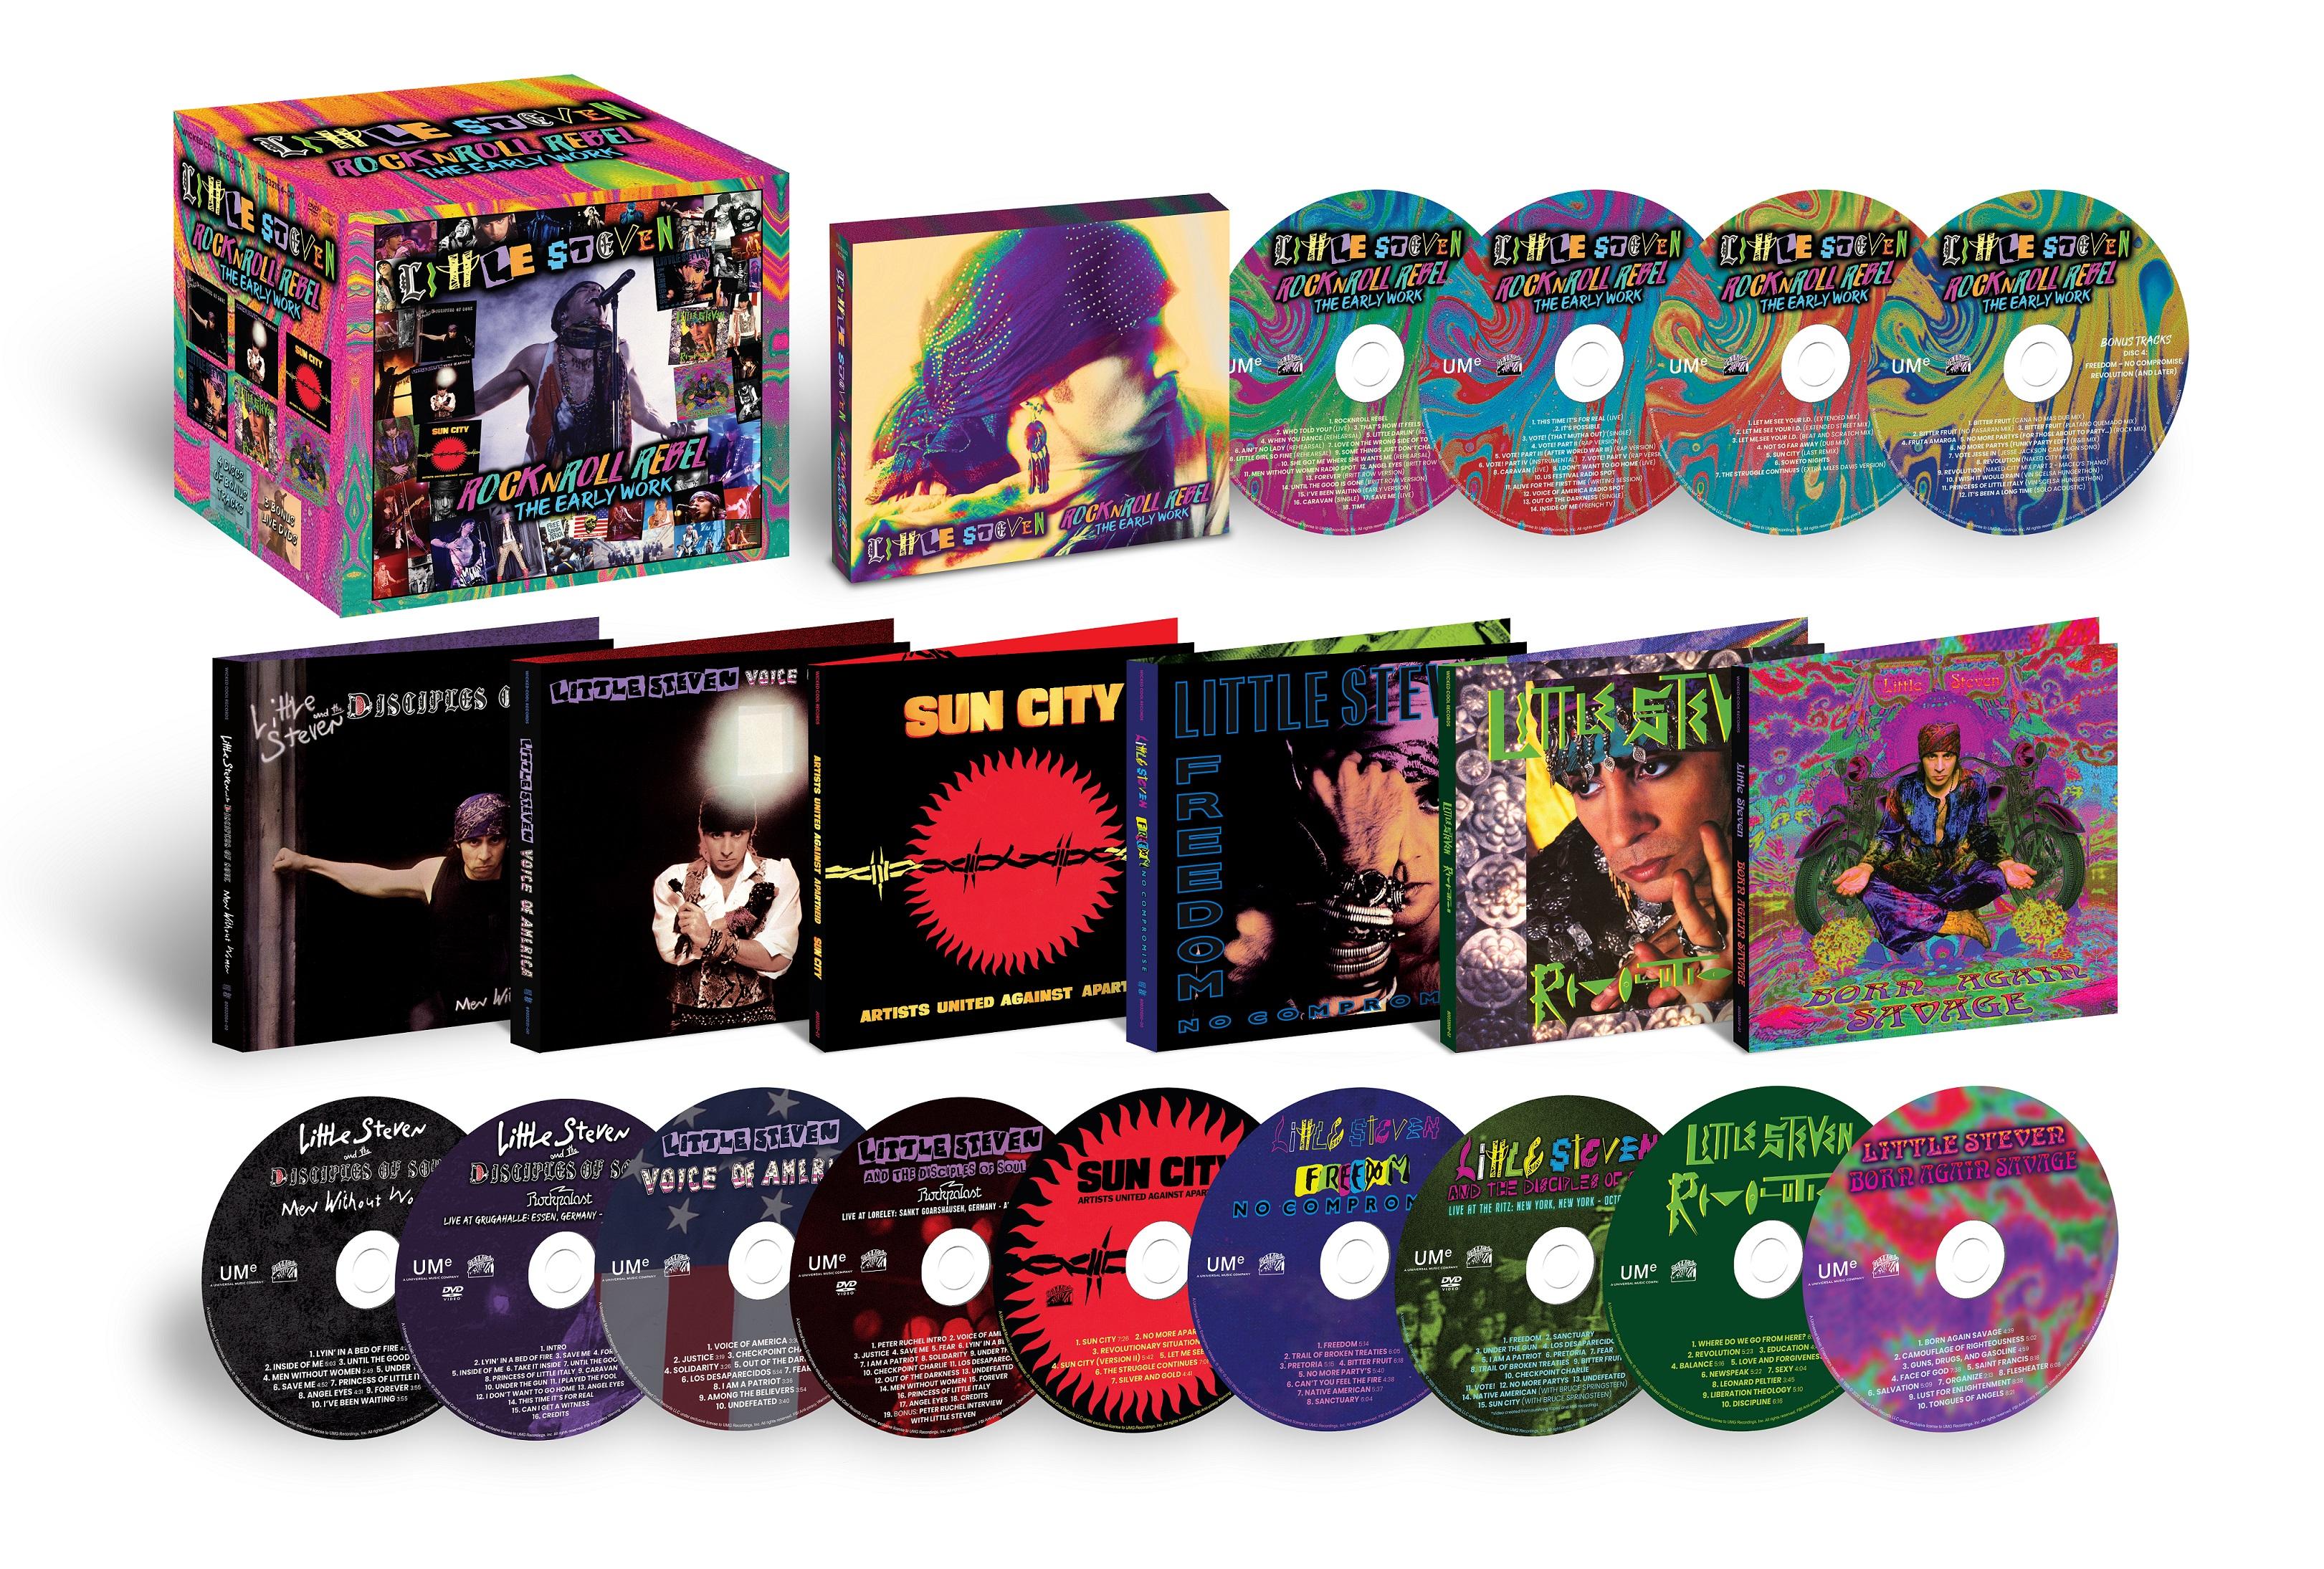 SVZ-Rock N Roll Rebel-CD DVD Product Shot-Final.jpg